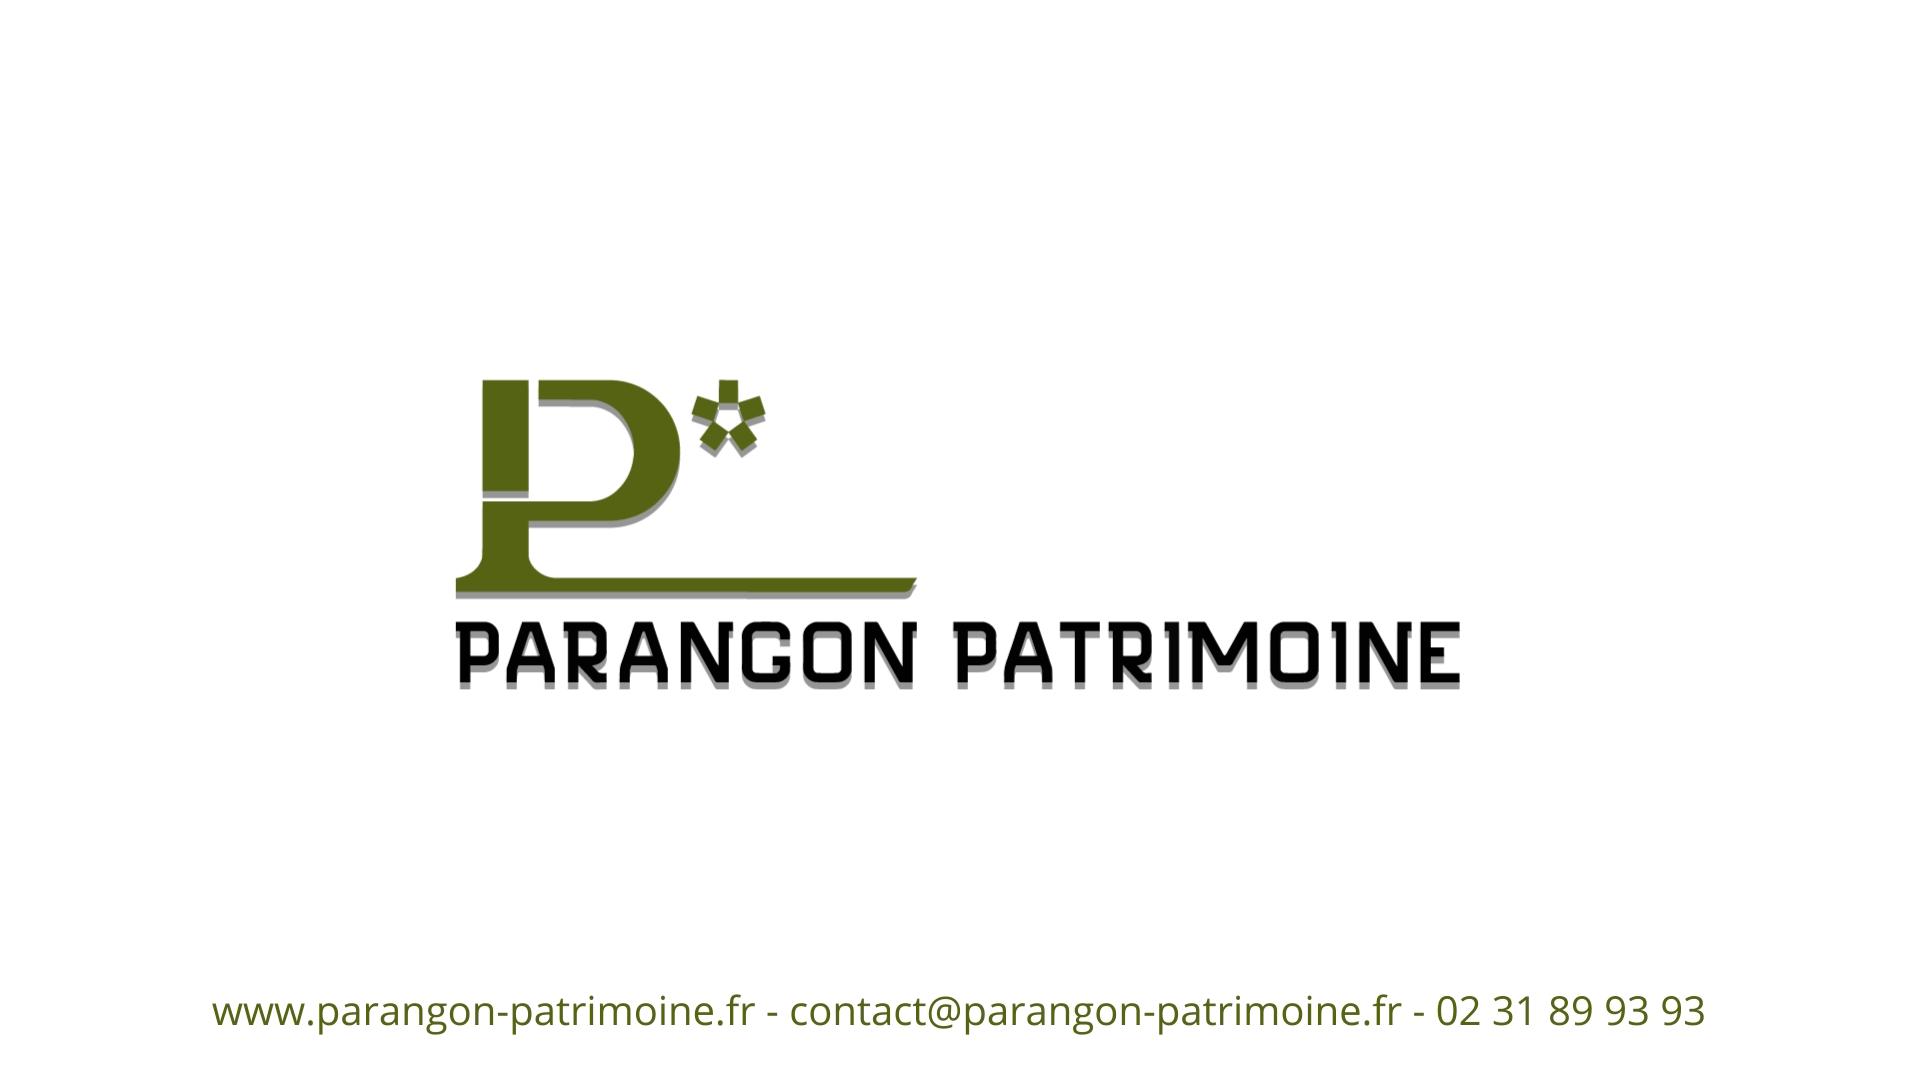 Logo PARANGON PATRIMOINE